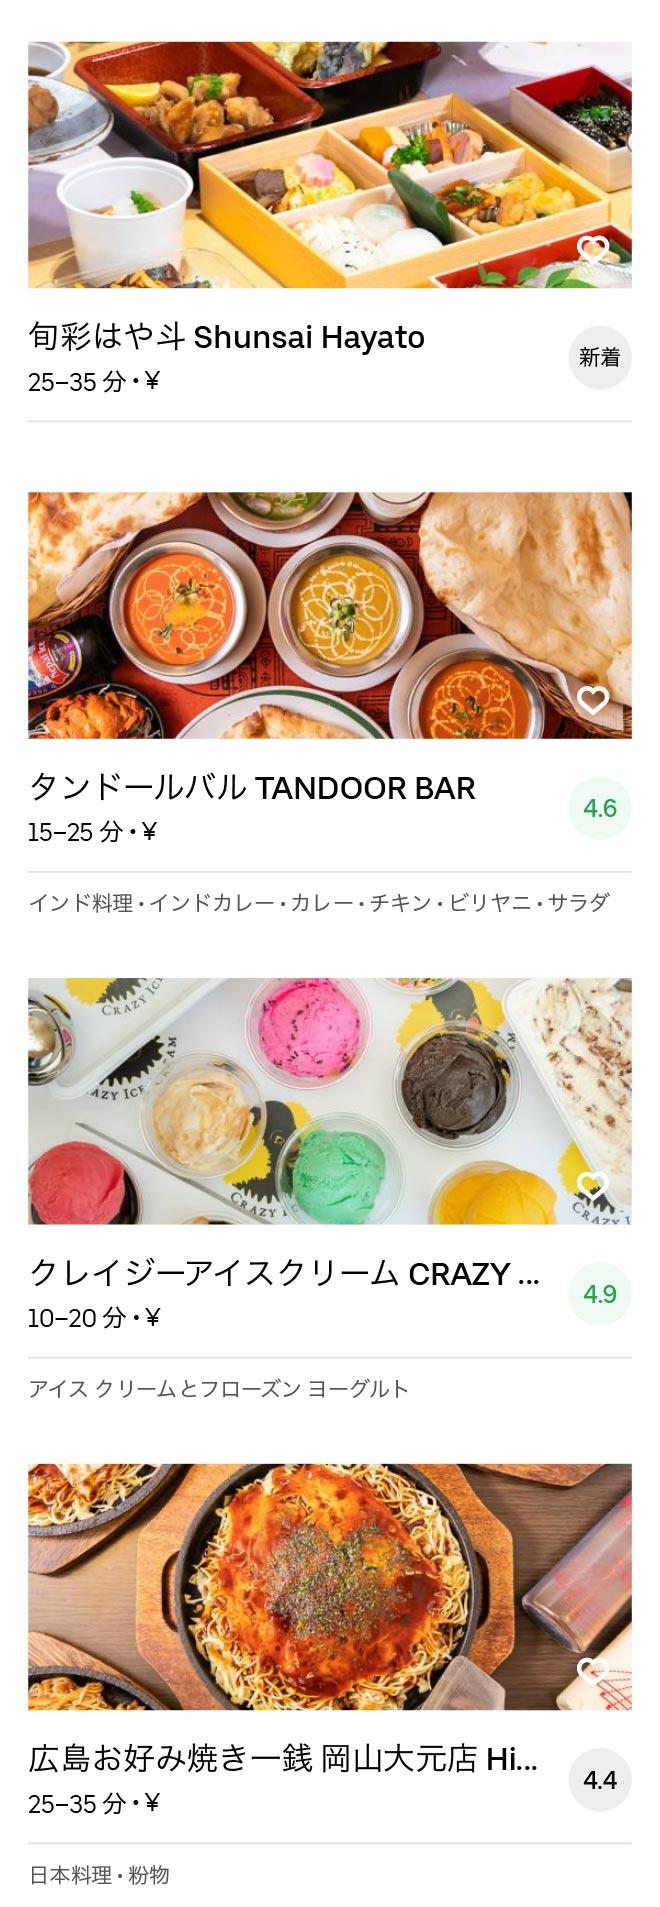 Okayama menu 2007 11